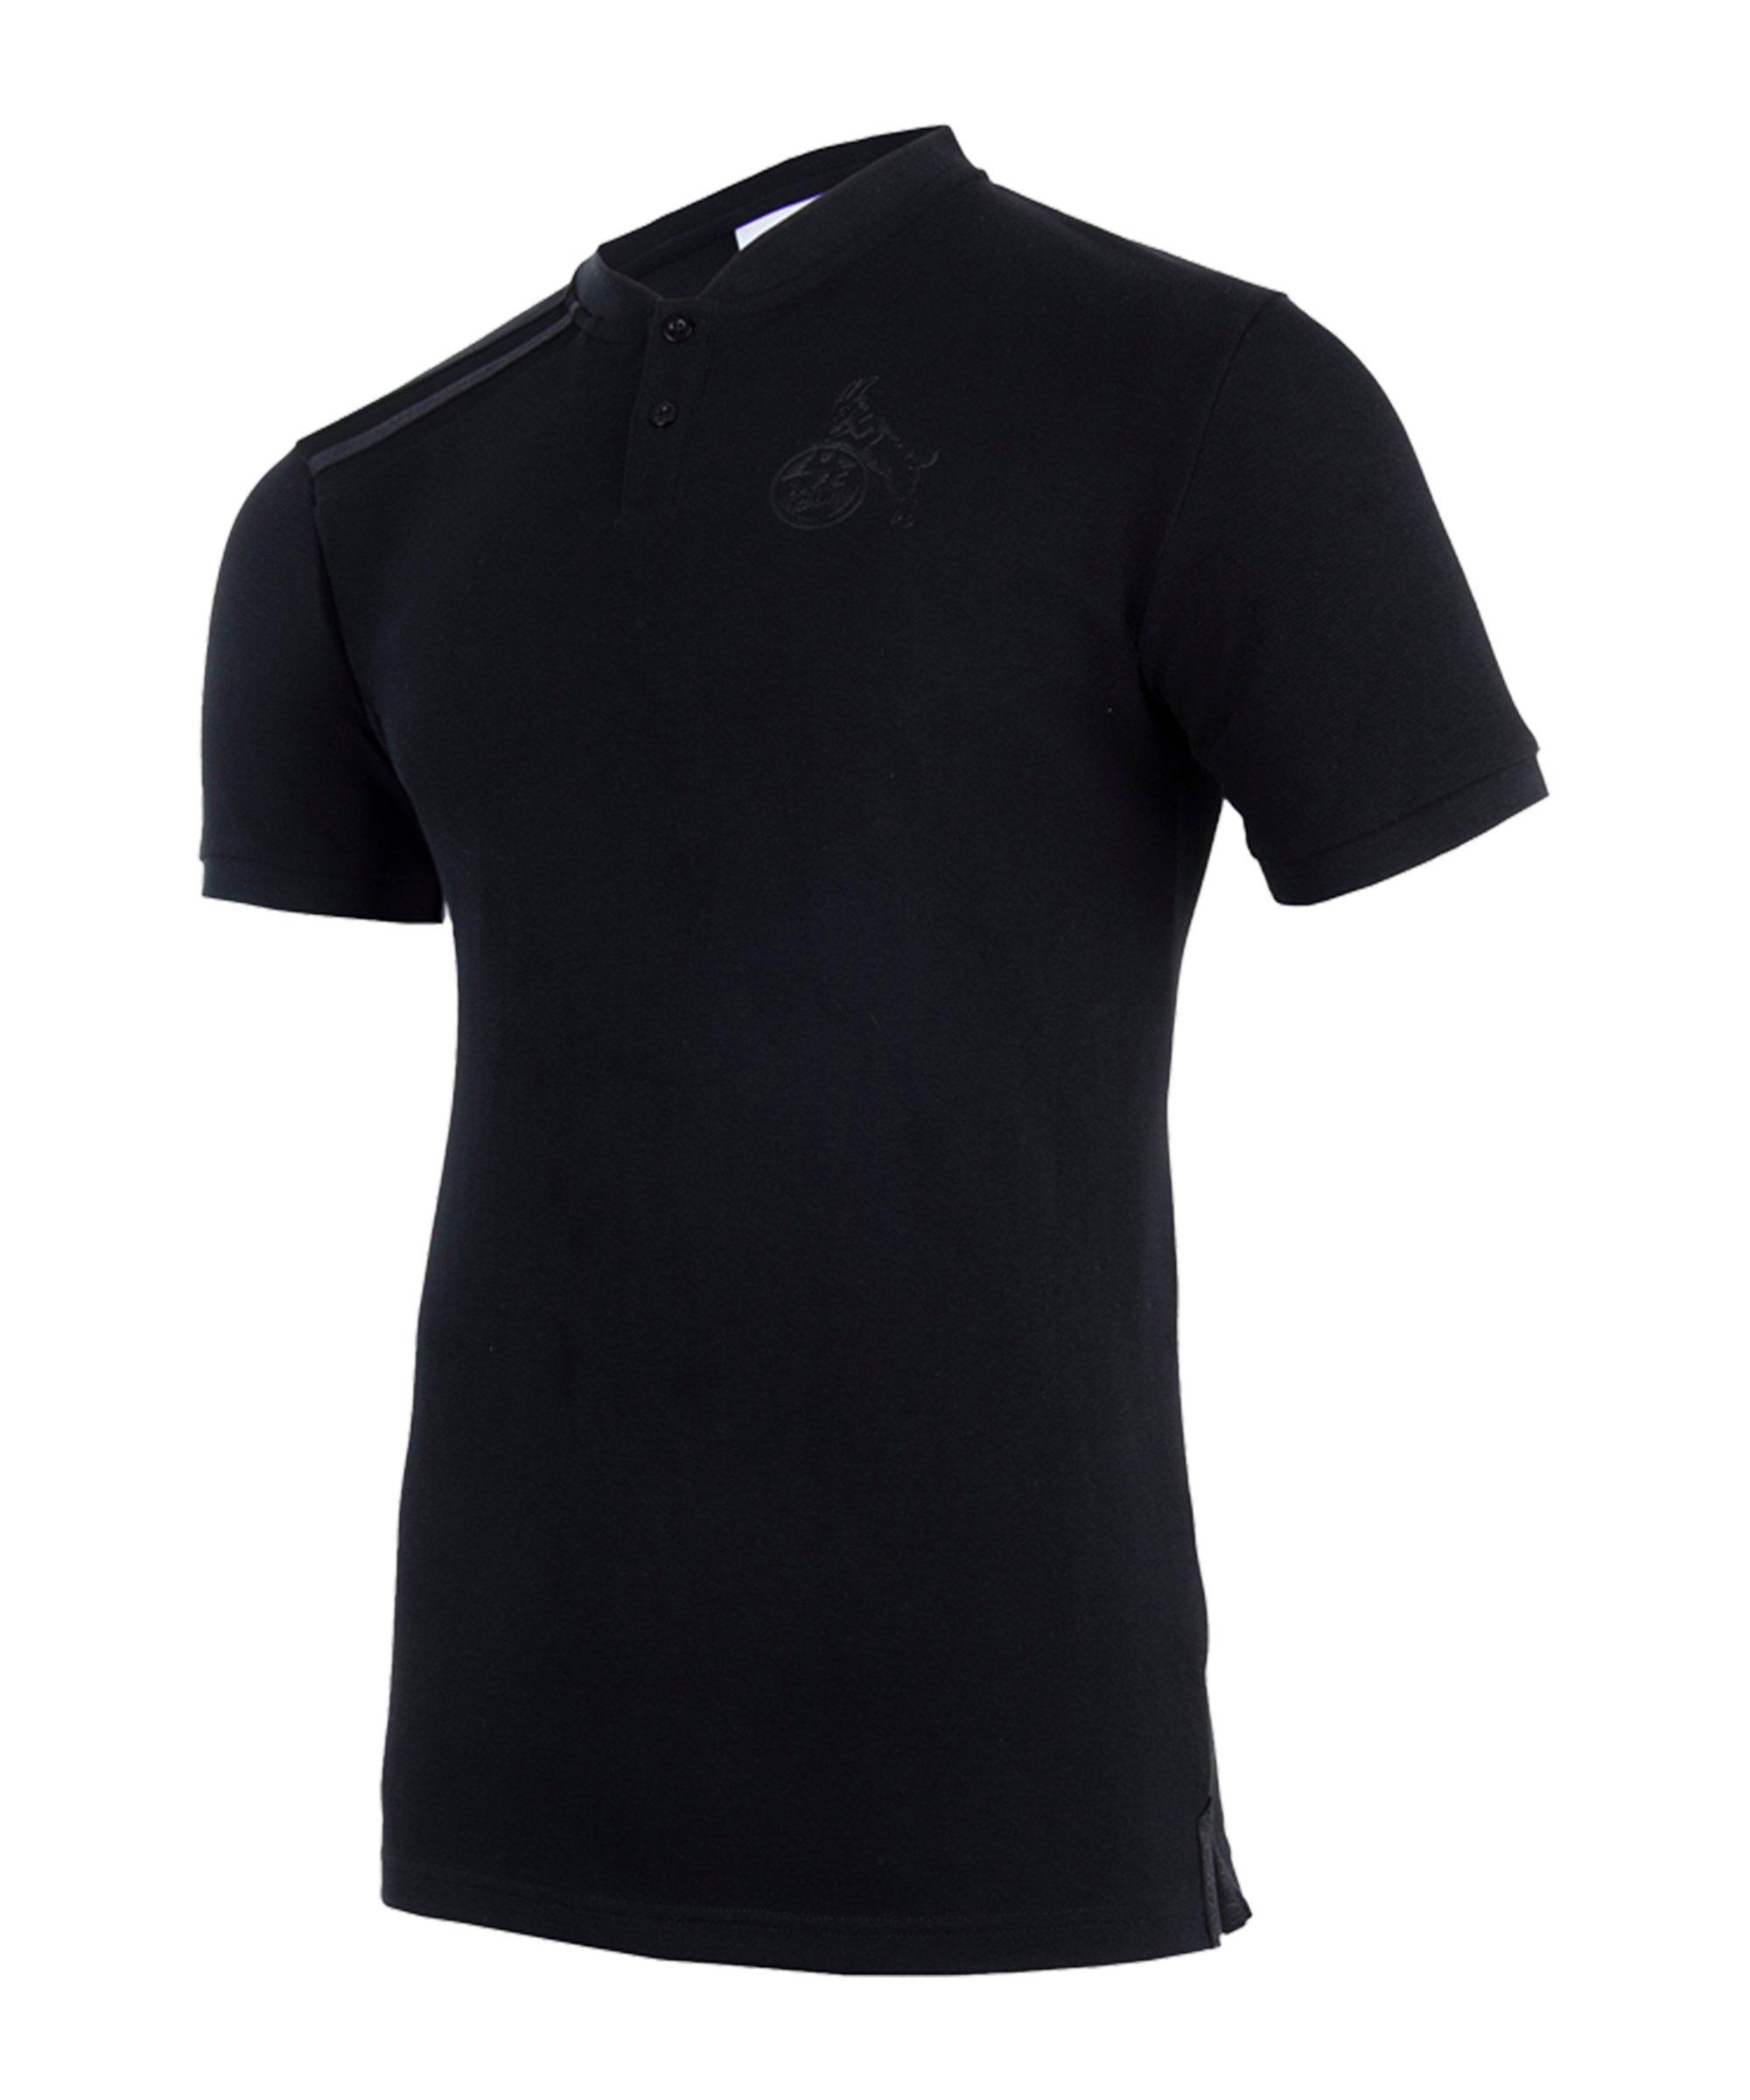 Uhlsport 1. FC Köln Blackline Poloshirt Schwarz - schwarz